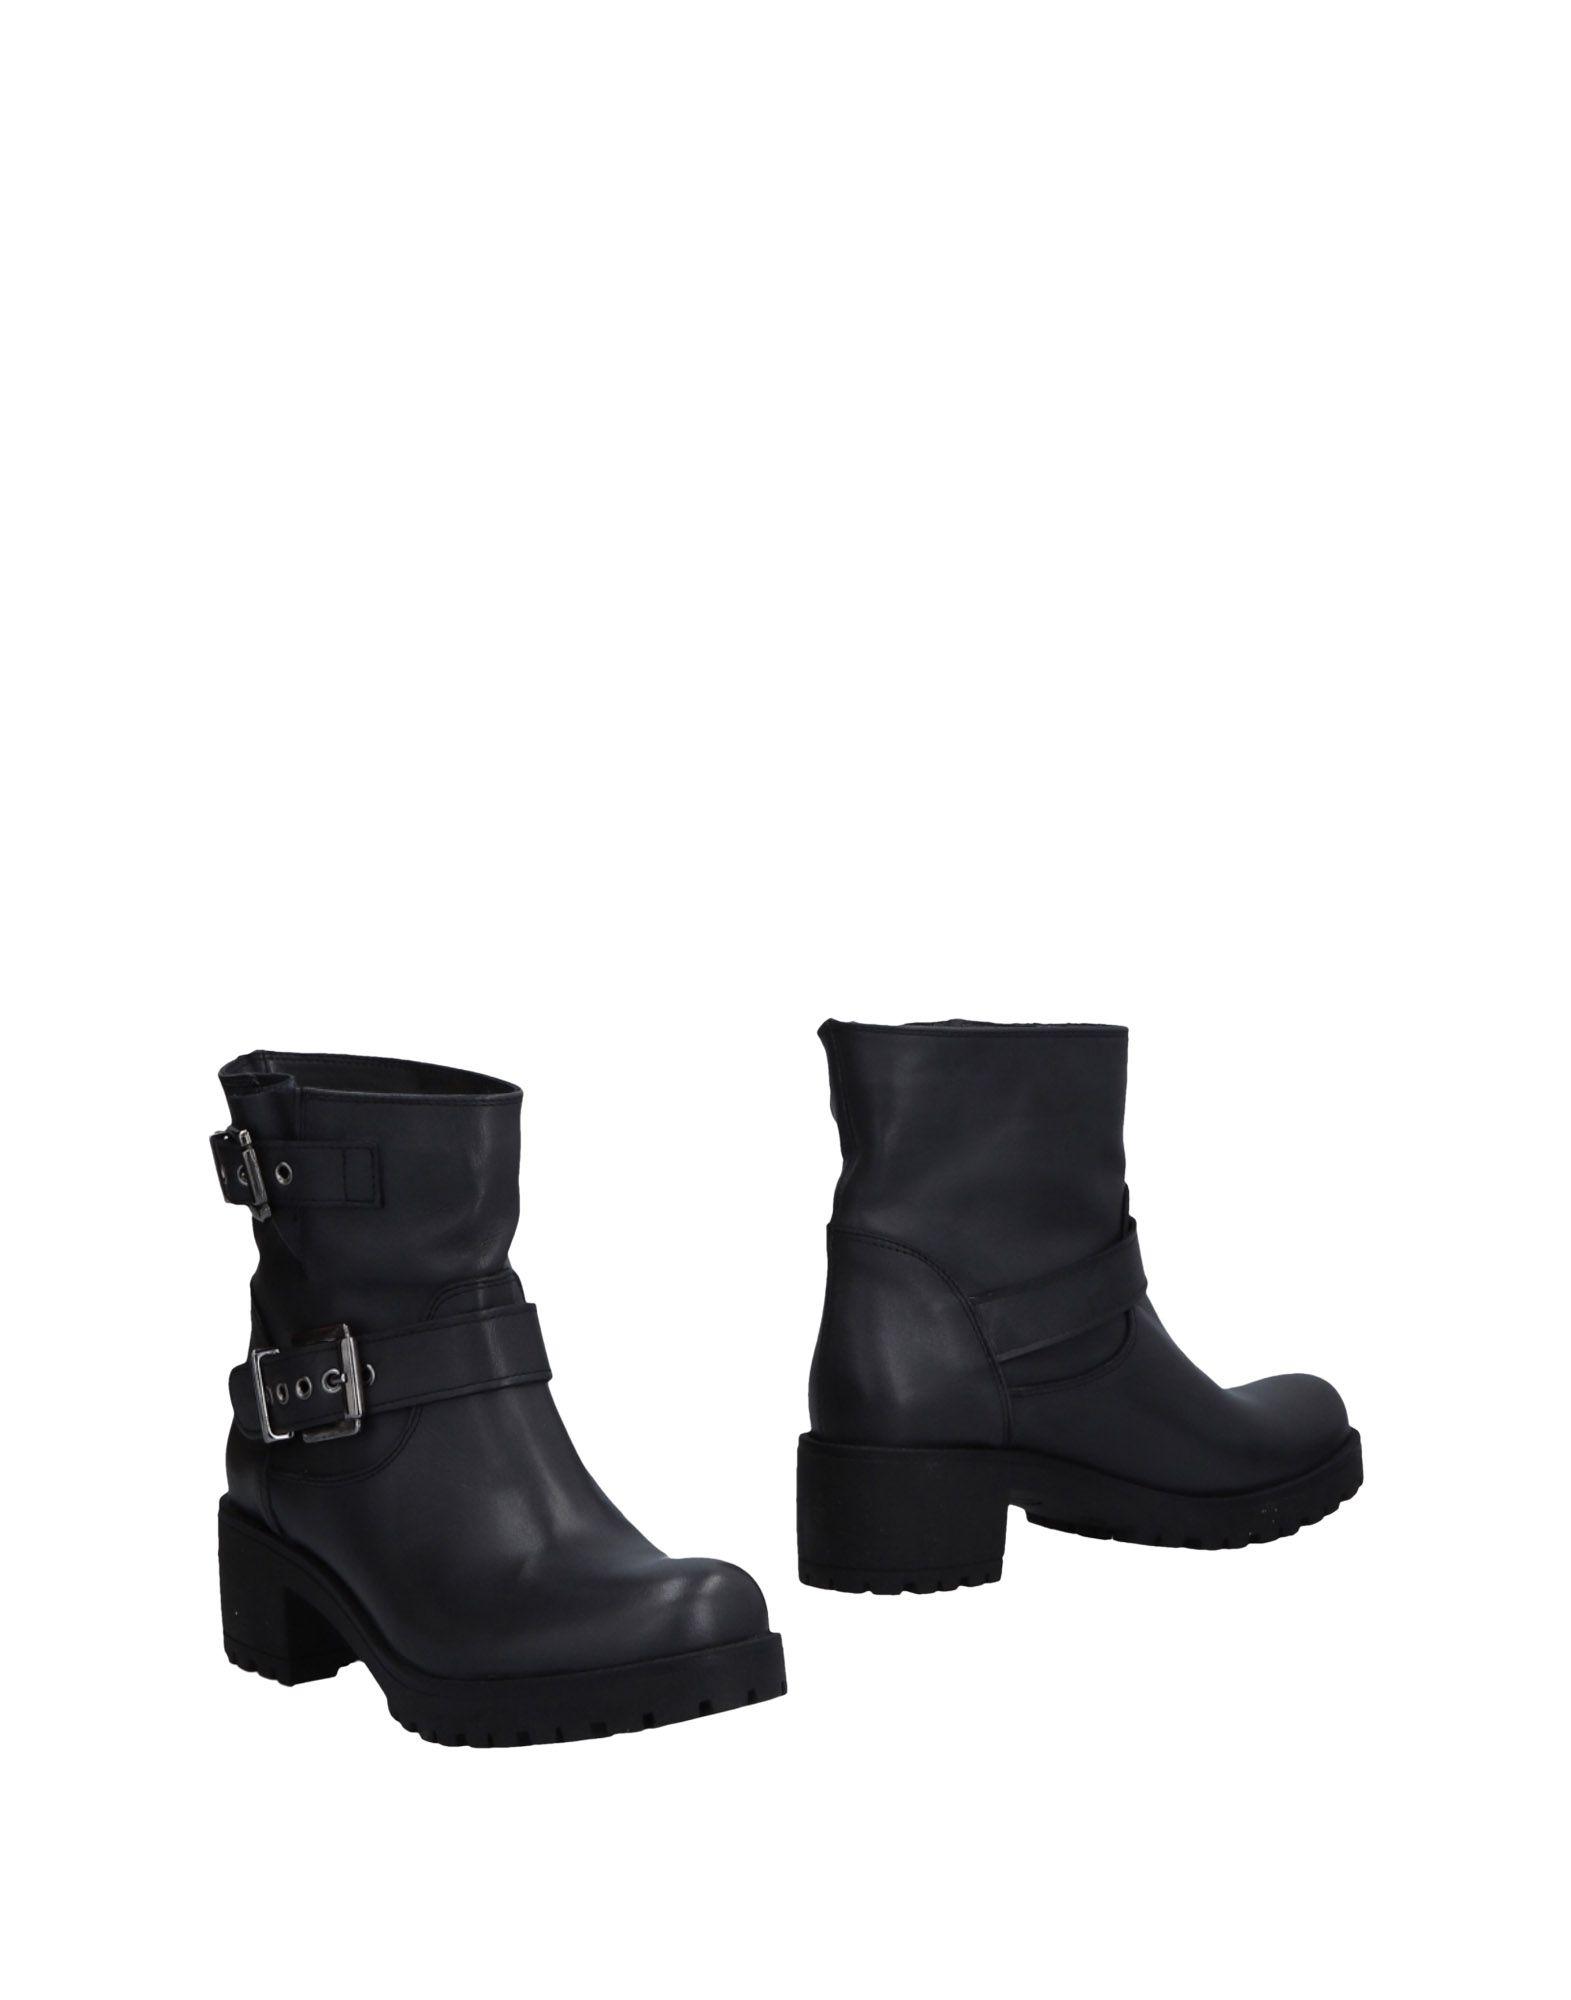 Unlace Unlace Unlace Stiefelette Damen 11471691BD Gute Qualität beliebte Schuhe 01b10c